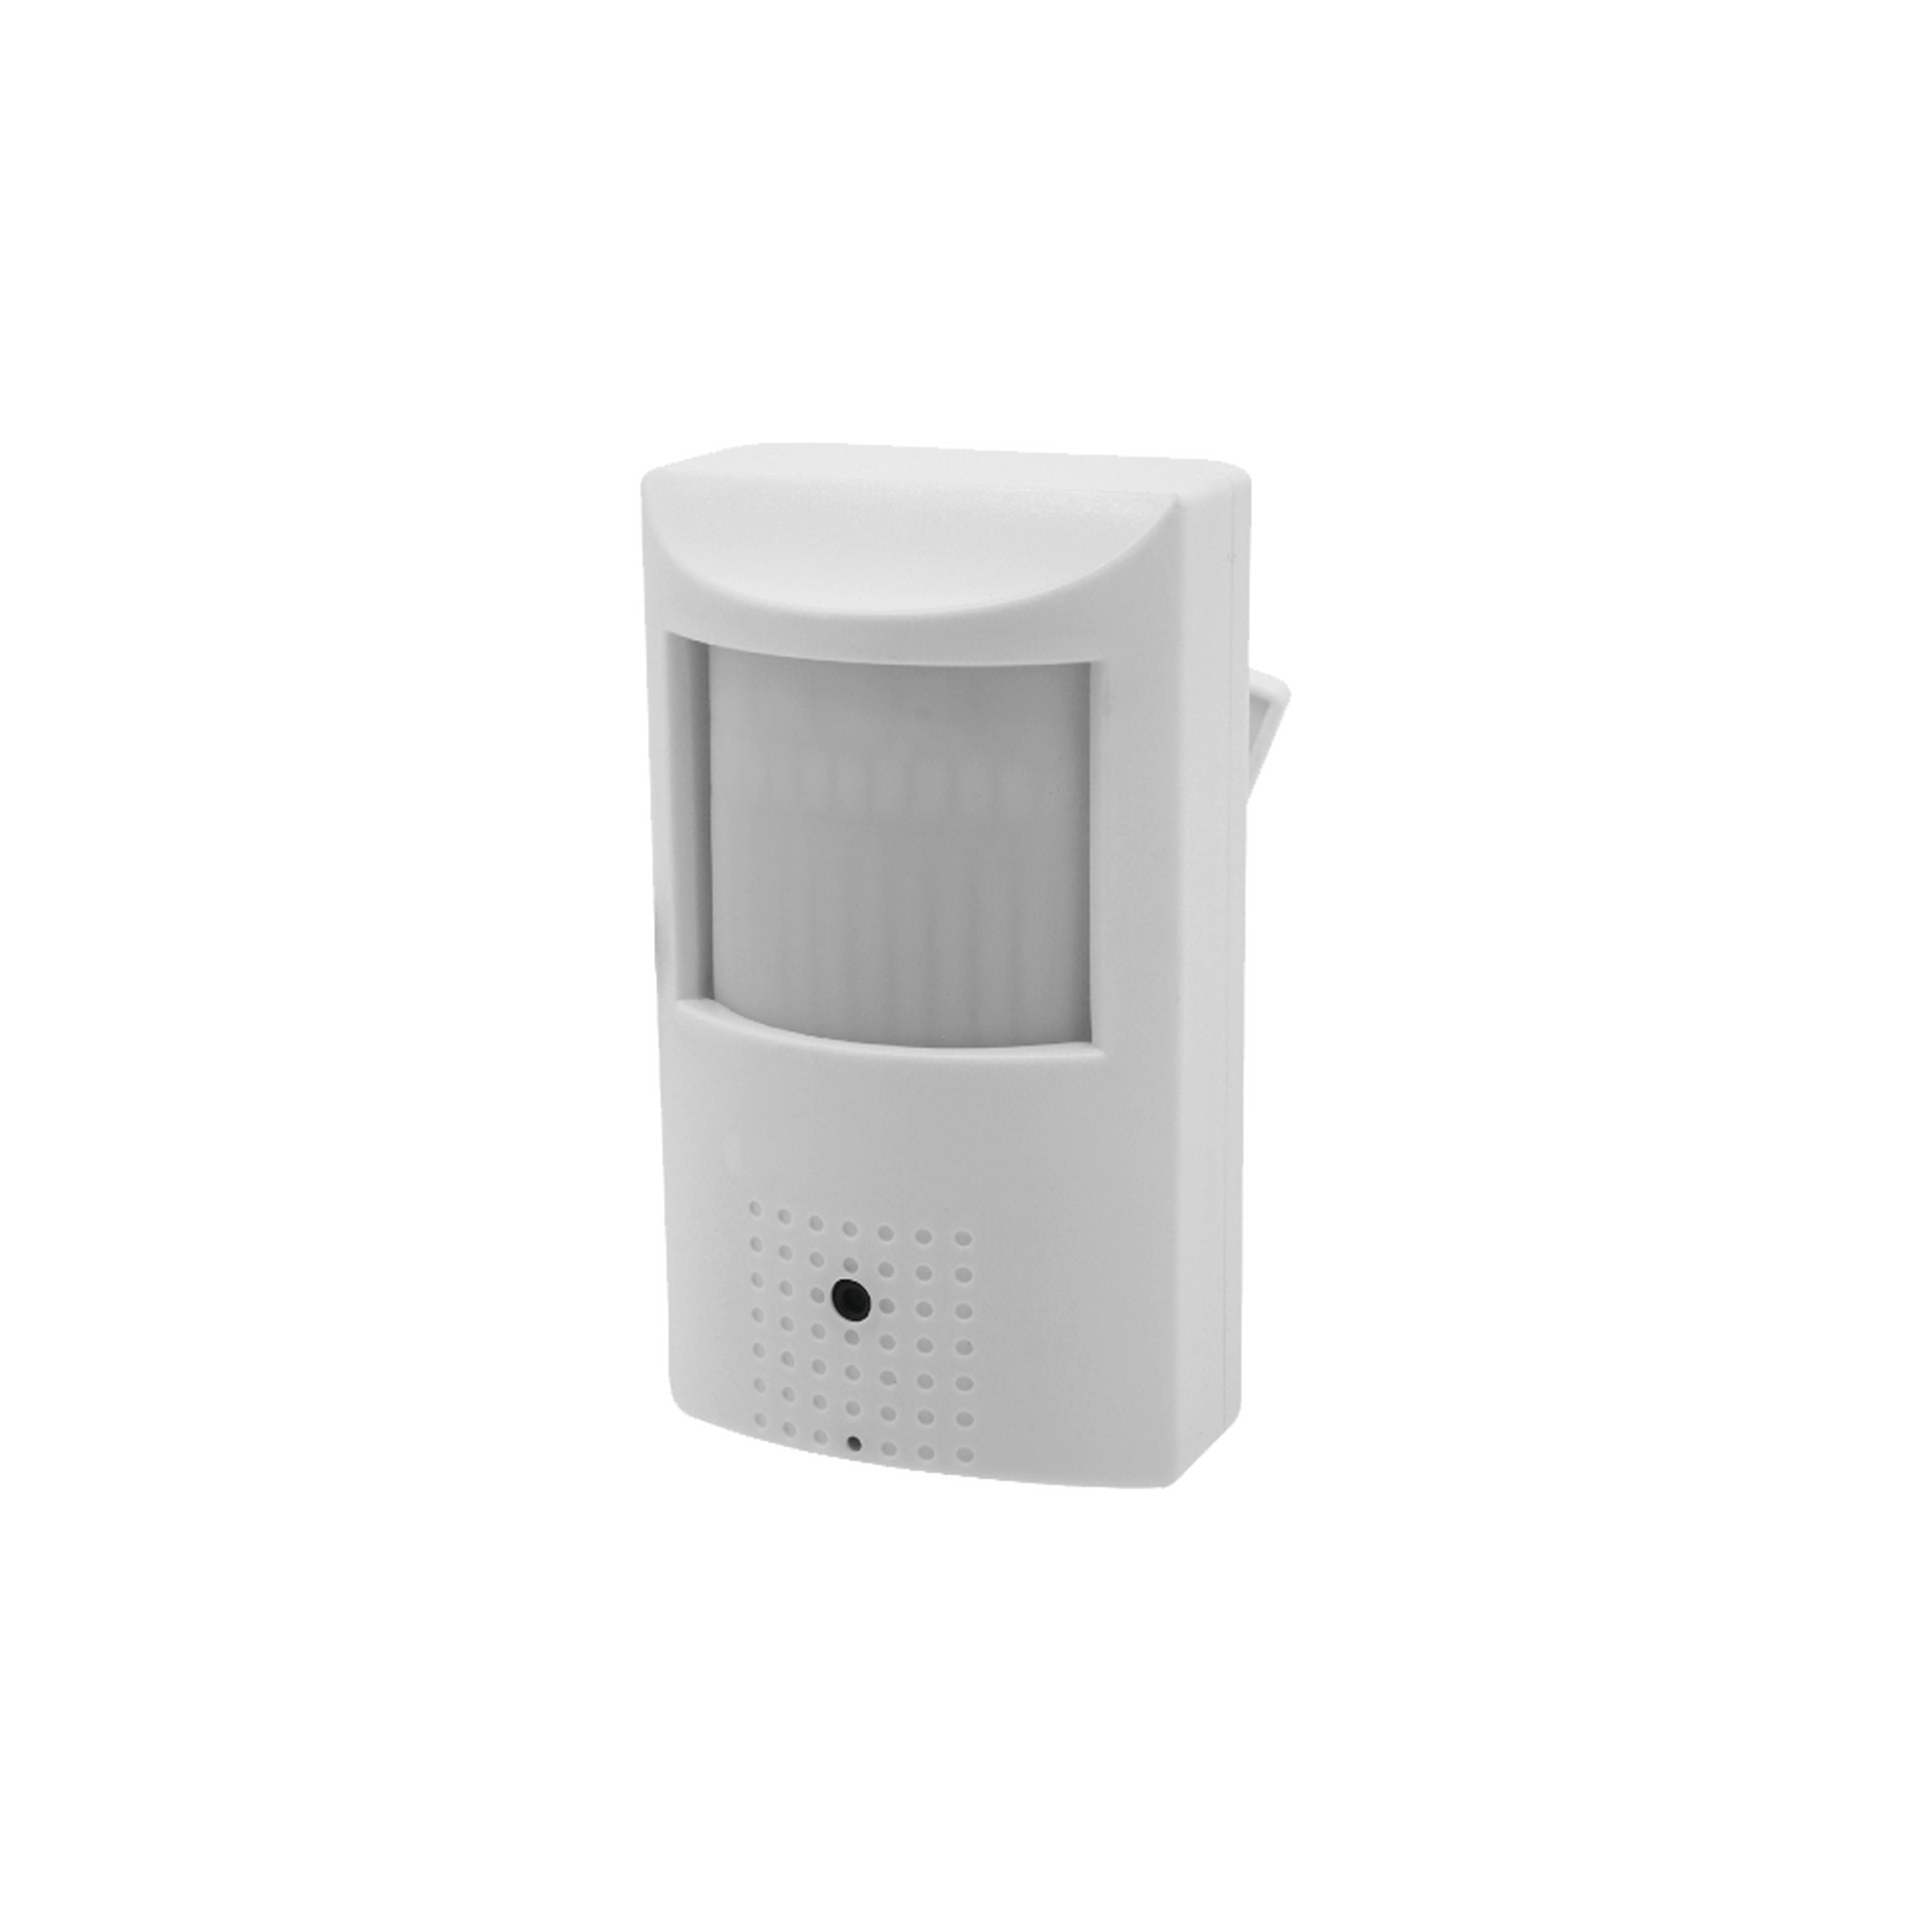 Cámara híbrida oculta en sensor de movimiento / 2 Megapixel (1080p) TurboHD / Analogo